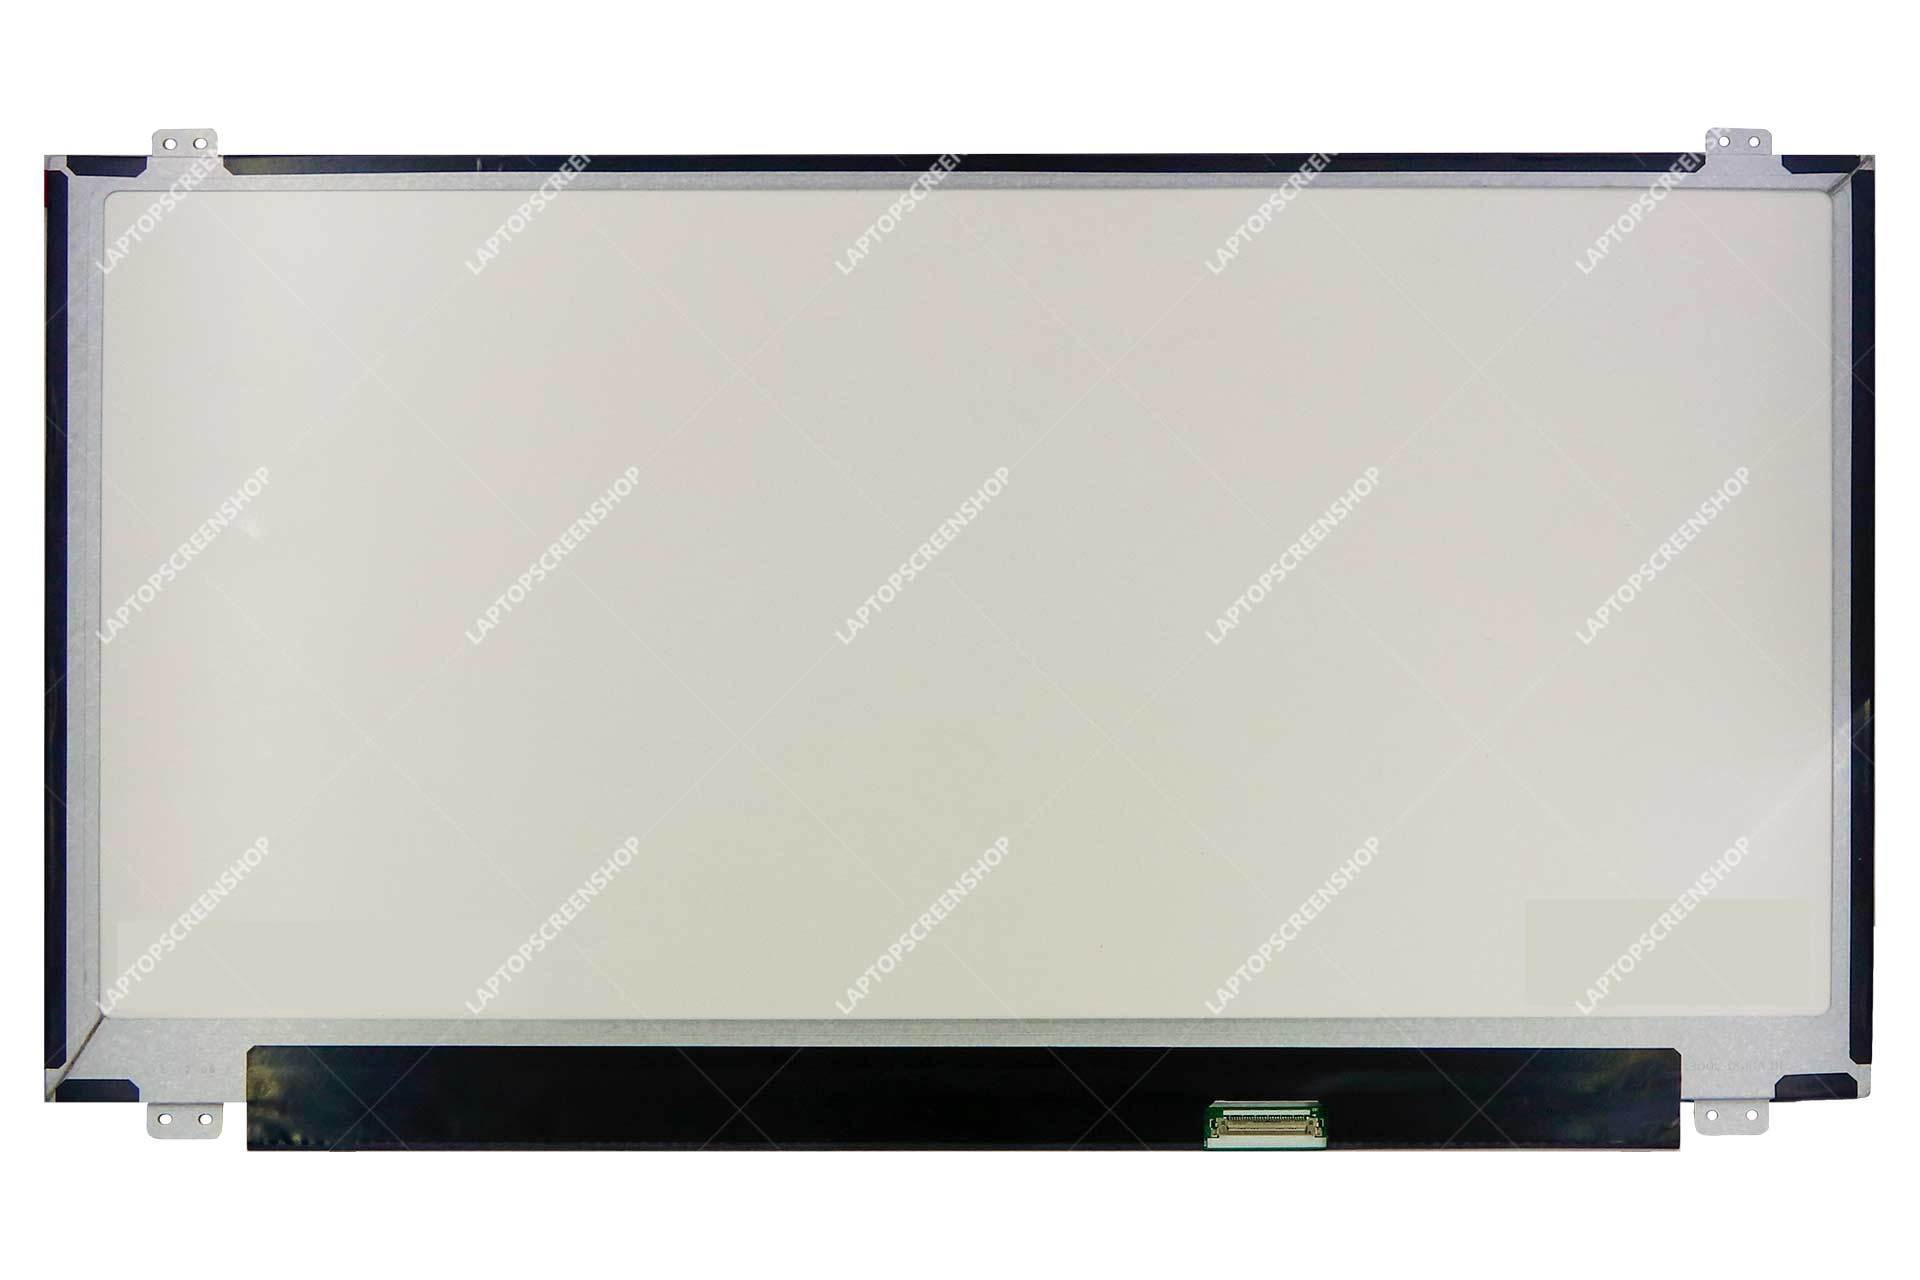 ACER-ASPIRE-E1-470-6806-LCD-LCD  HD فروشگاه لپ تاپ اسکرين   تعمير لپ تاپ